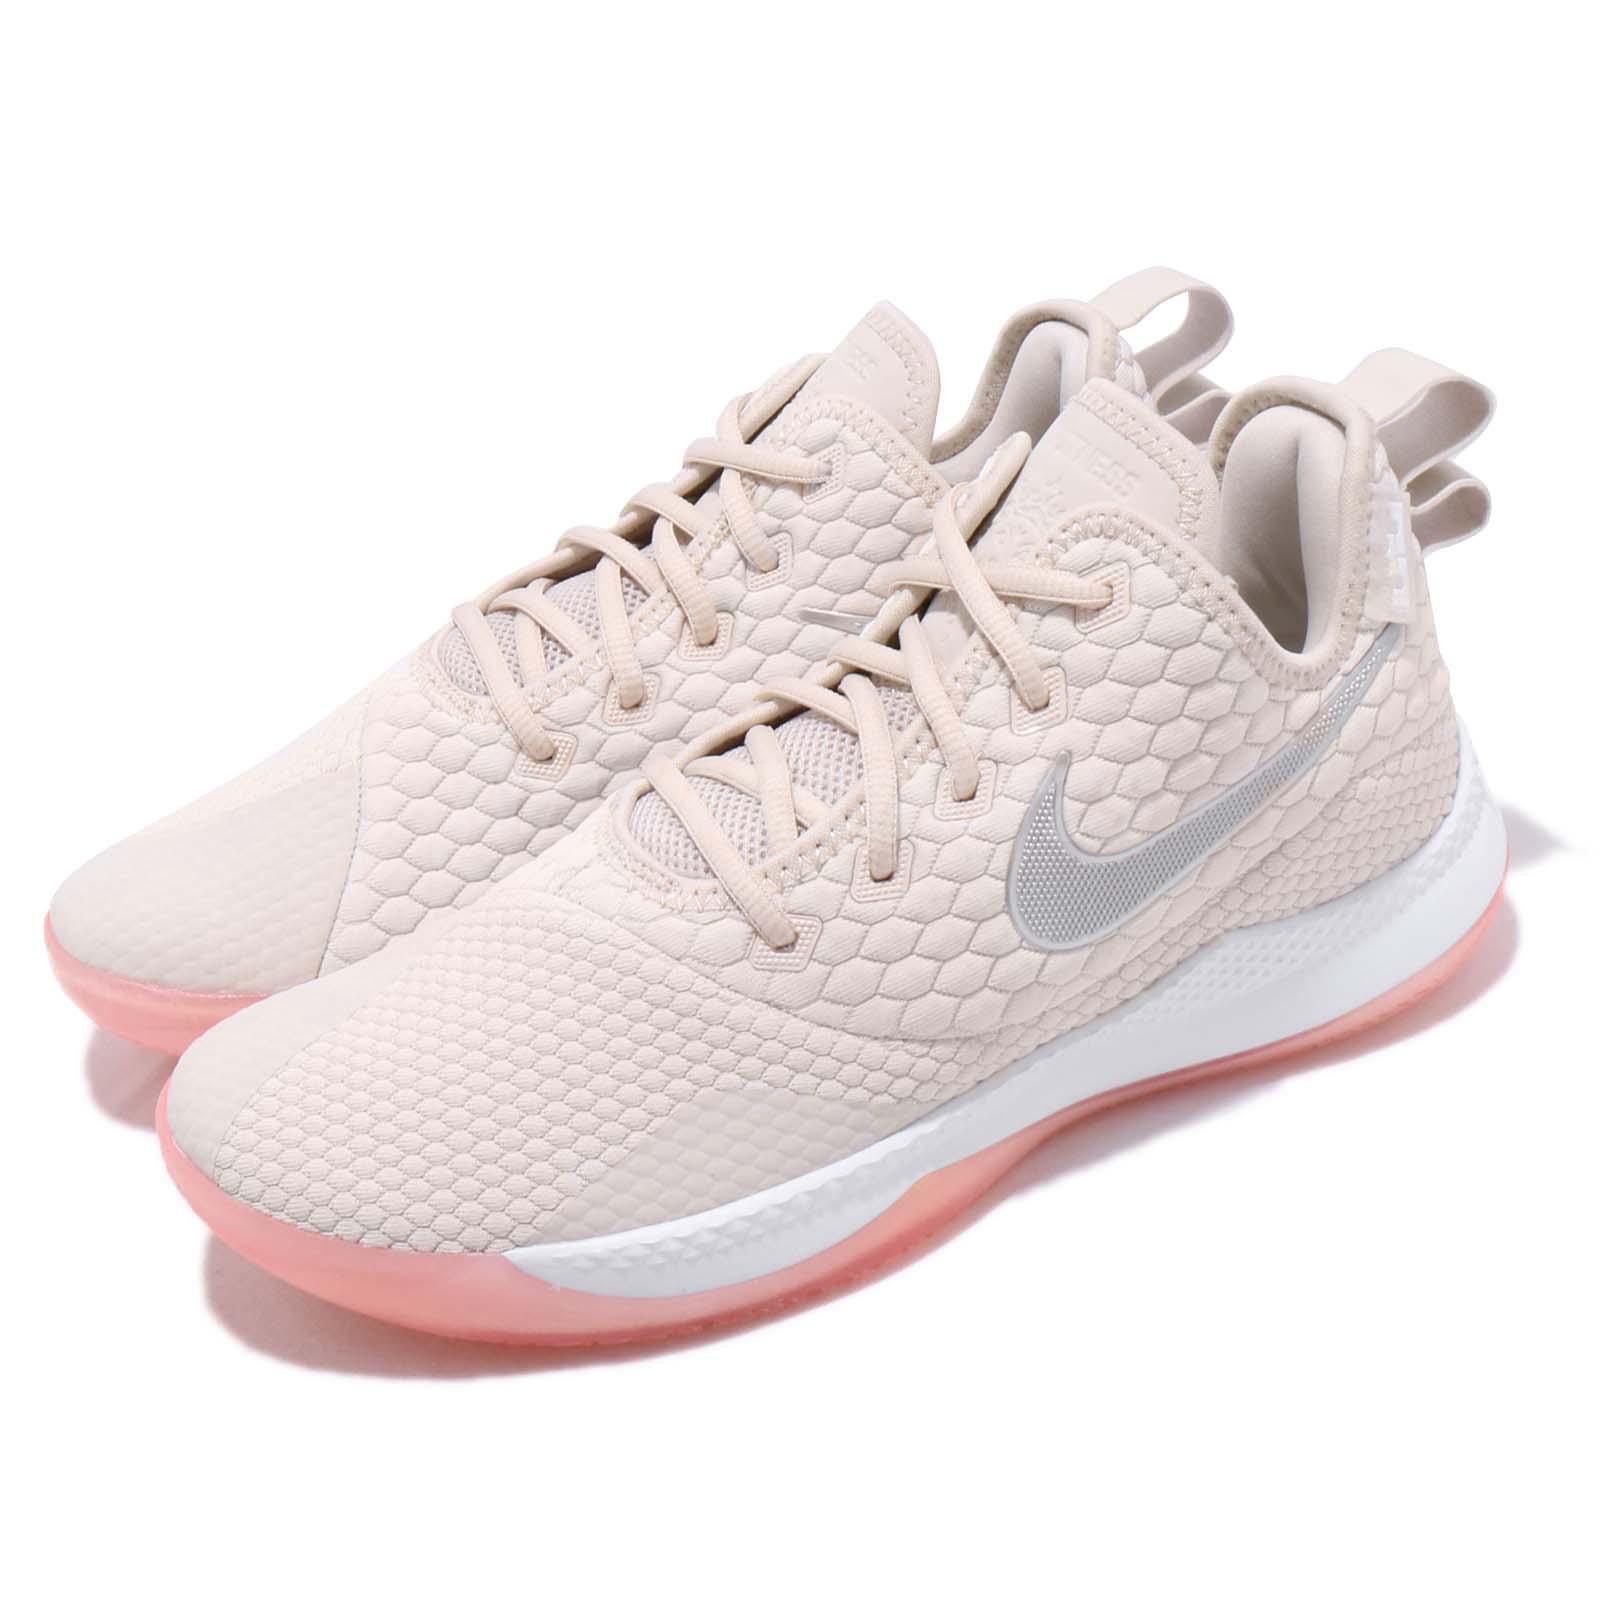 Nike LeBron Witness III EP 3 James LBJ Light Orewood Brown Men shoes AO4432-100